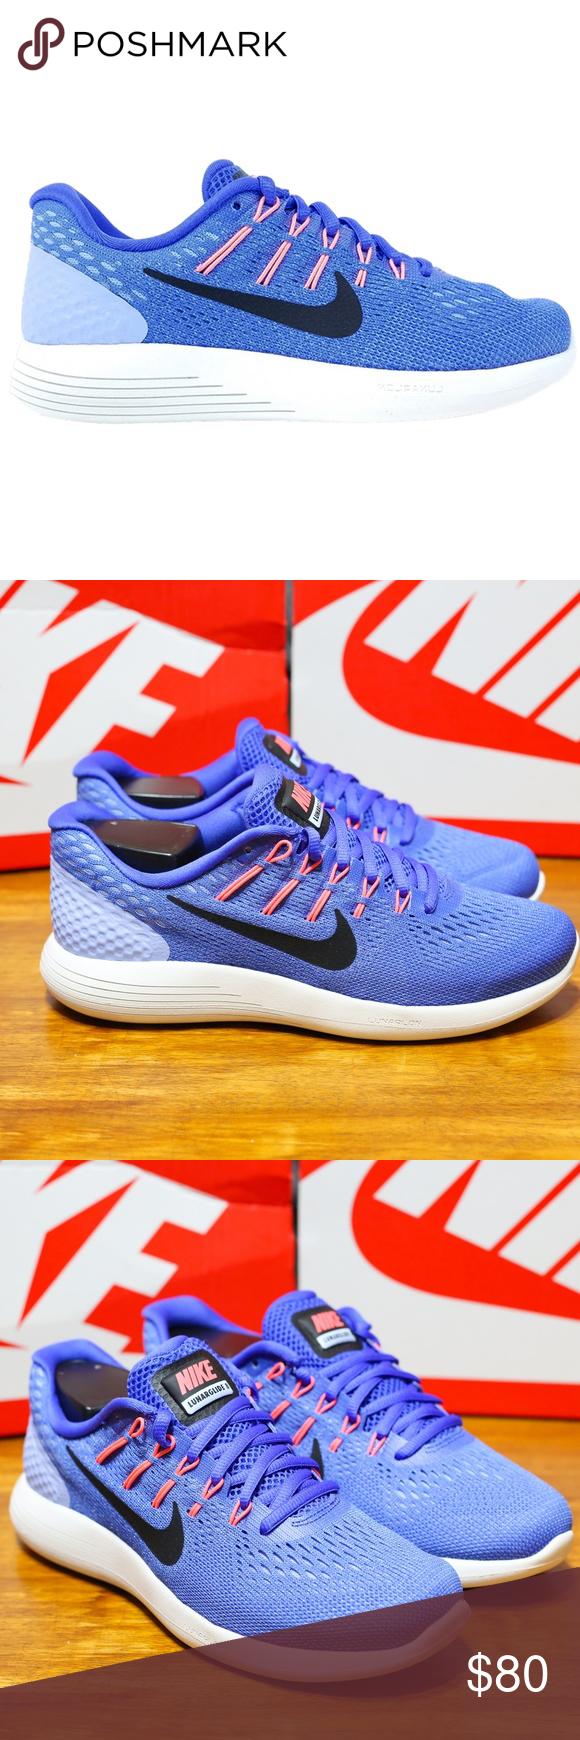 d3702c990e3e Nike Womens LunarGlide 8 Medium Blue AA8677-406 Nike Women s LunarGlide 8 - Running  Shoes